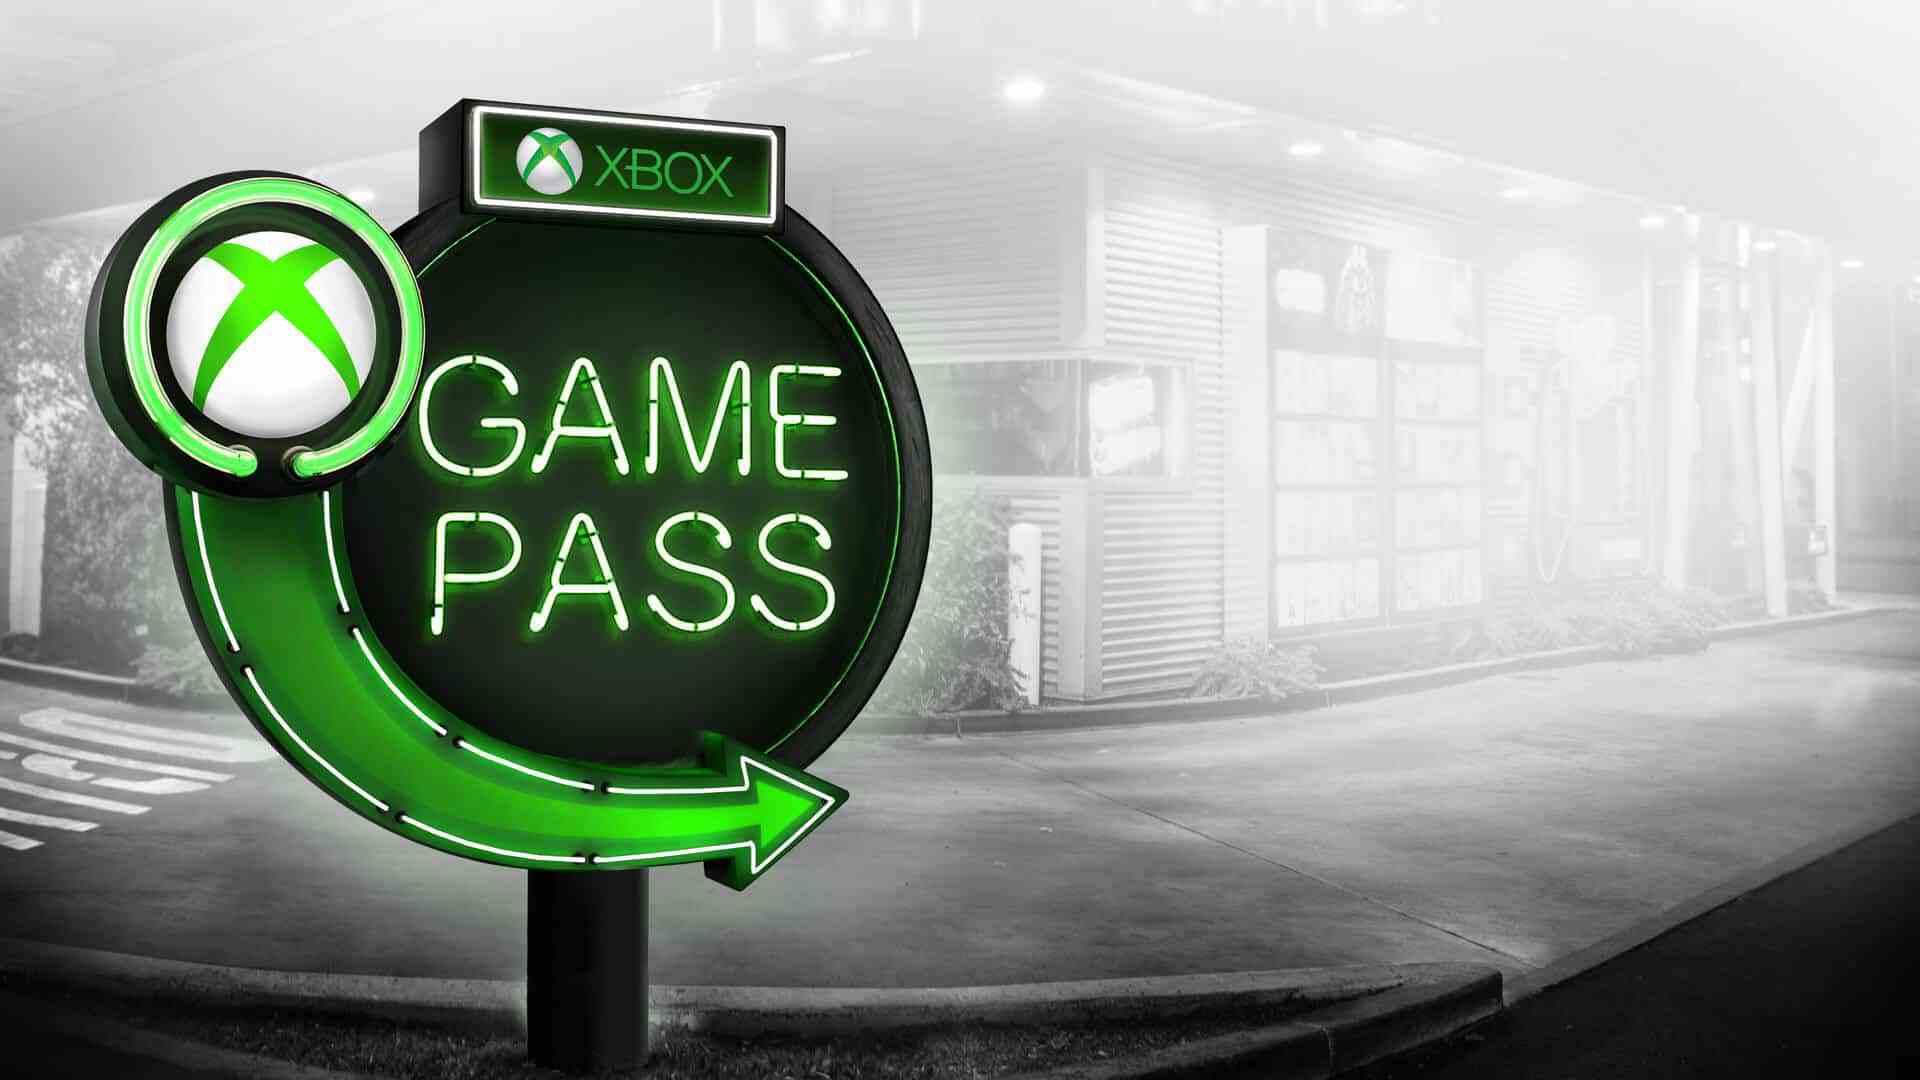 Xbox游戏通行证或上架Switch?微软与任天堂将获双赢